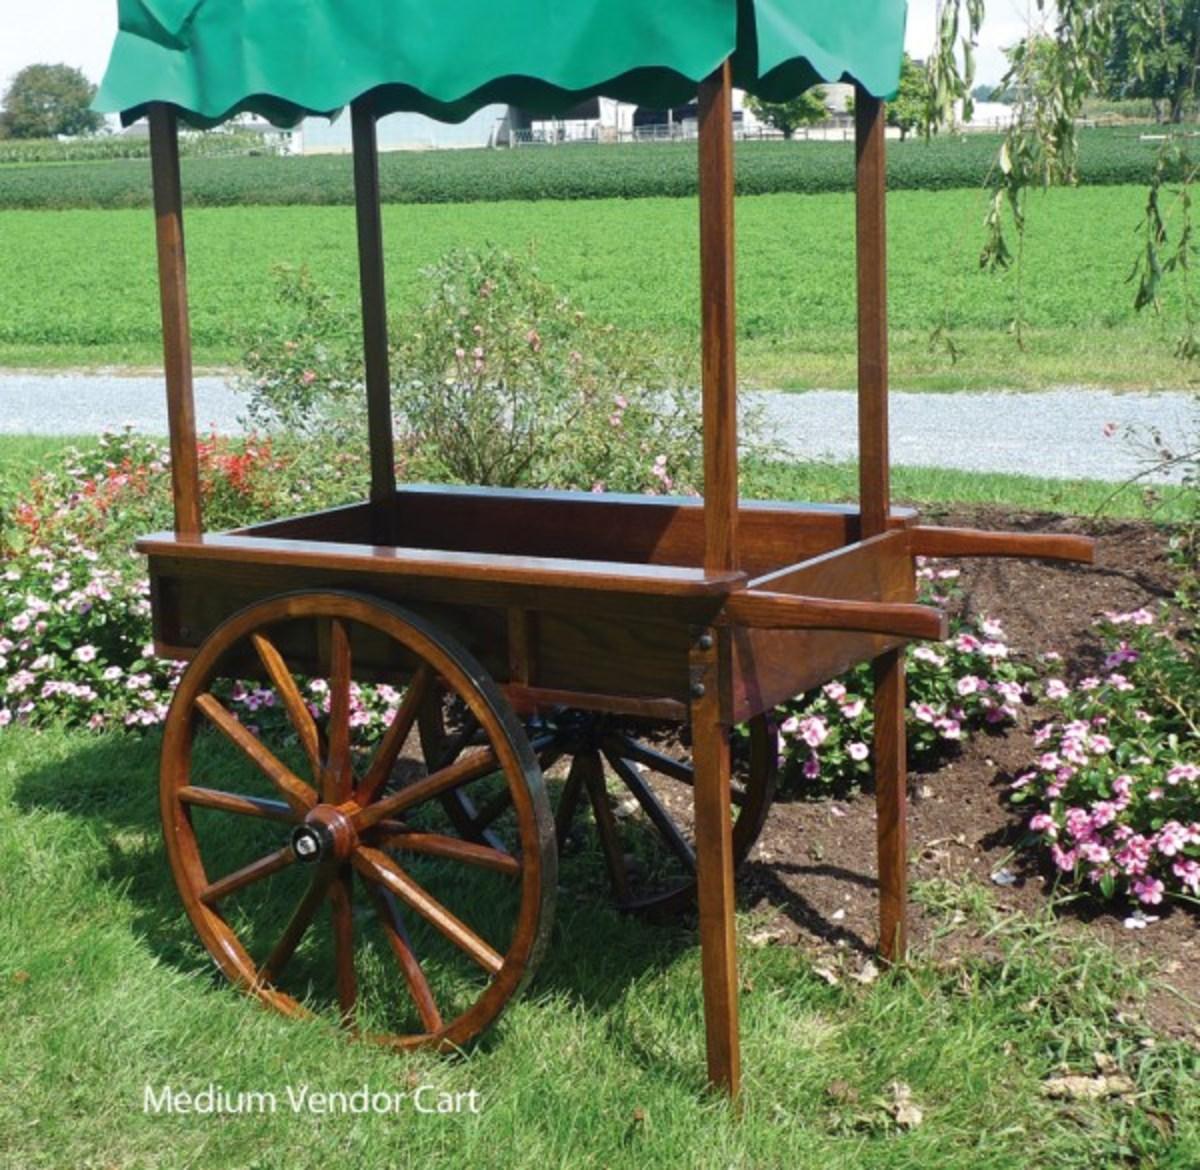 Peddler-Vendor Carts